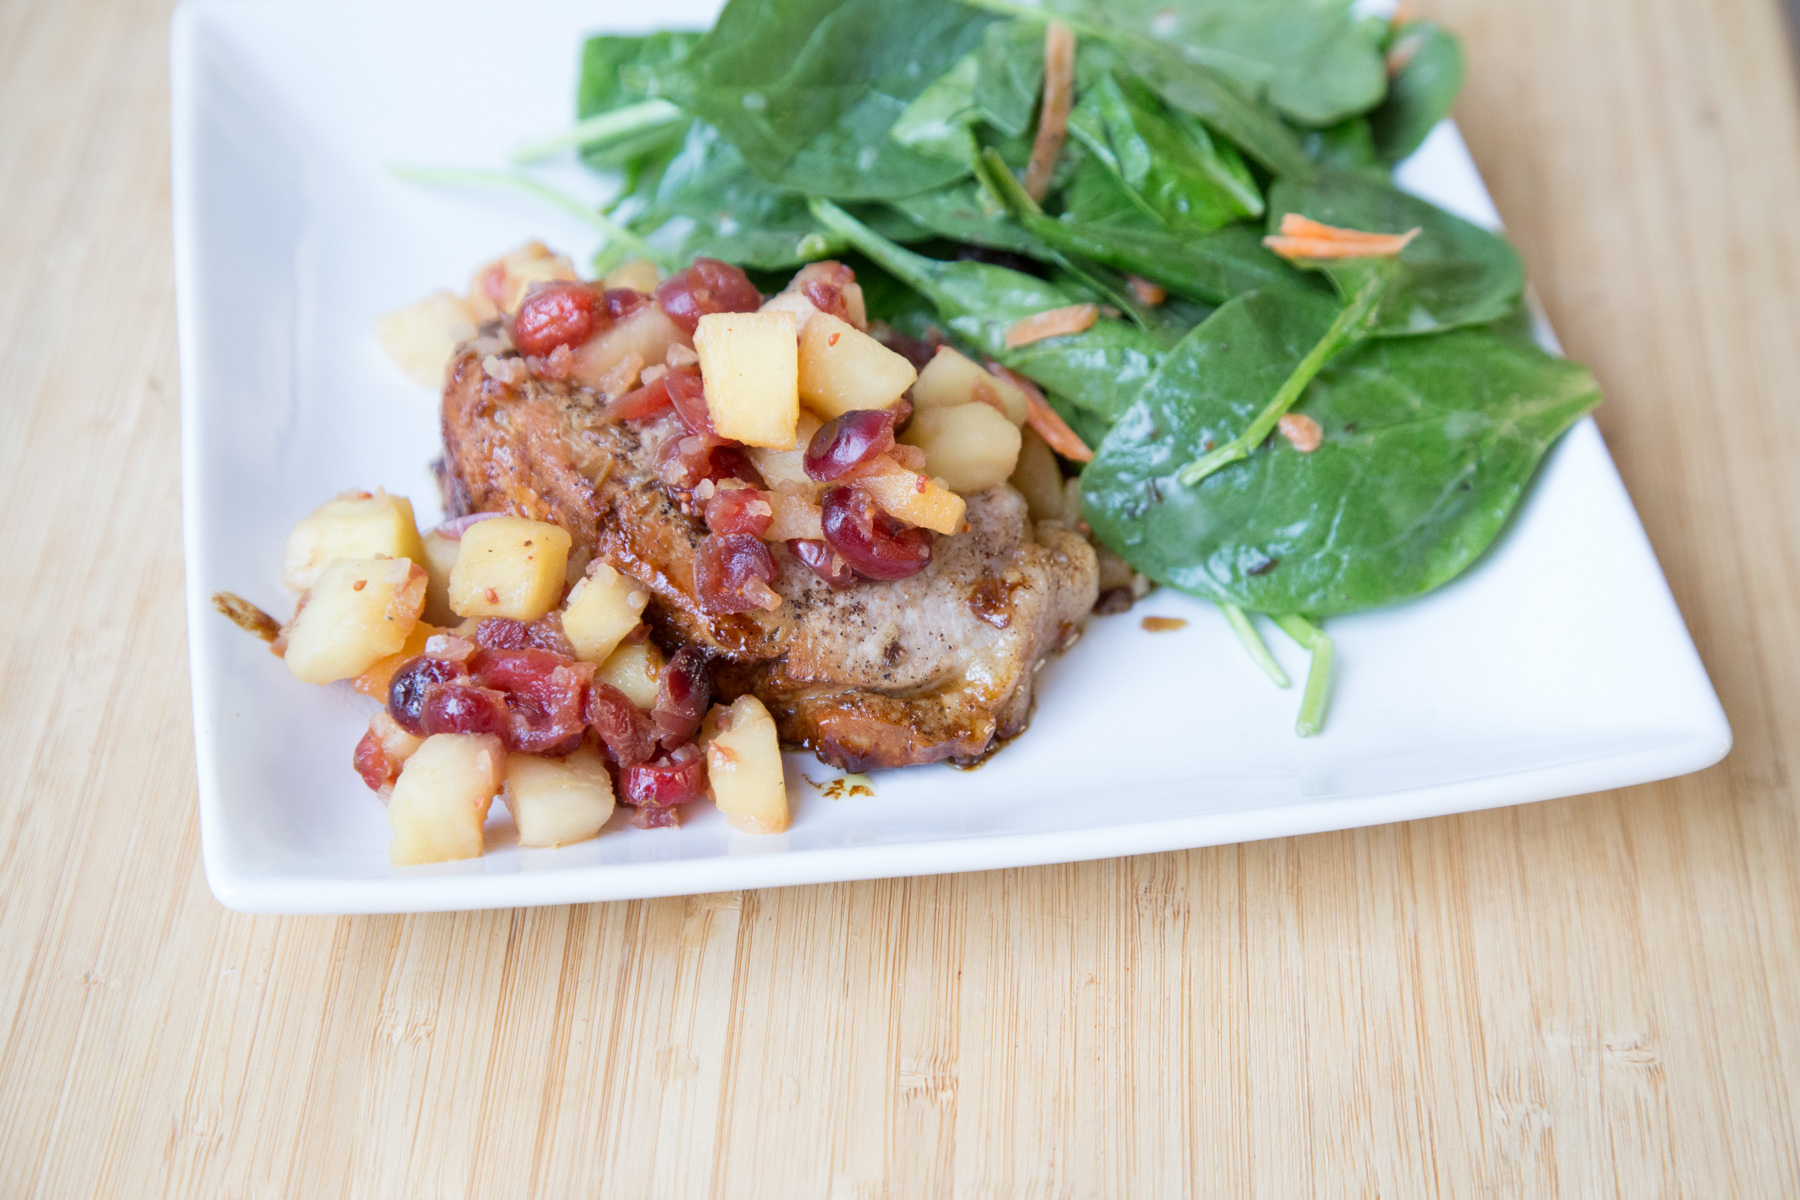 pork-roast-with-apple-relish